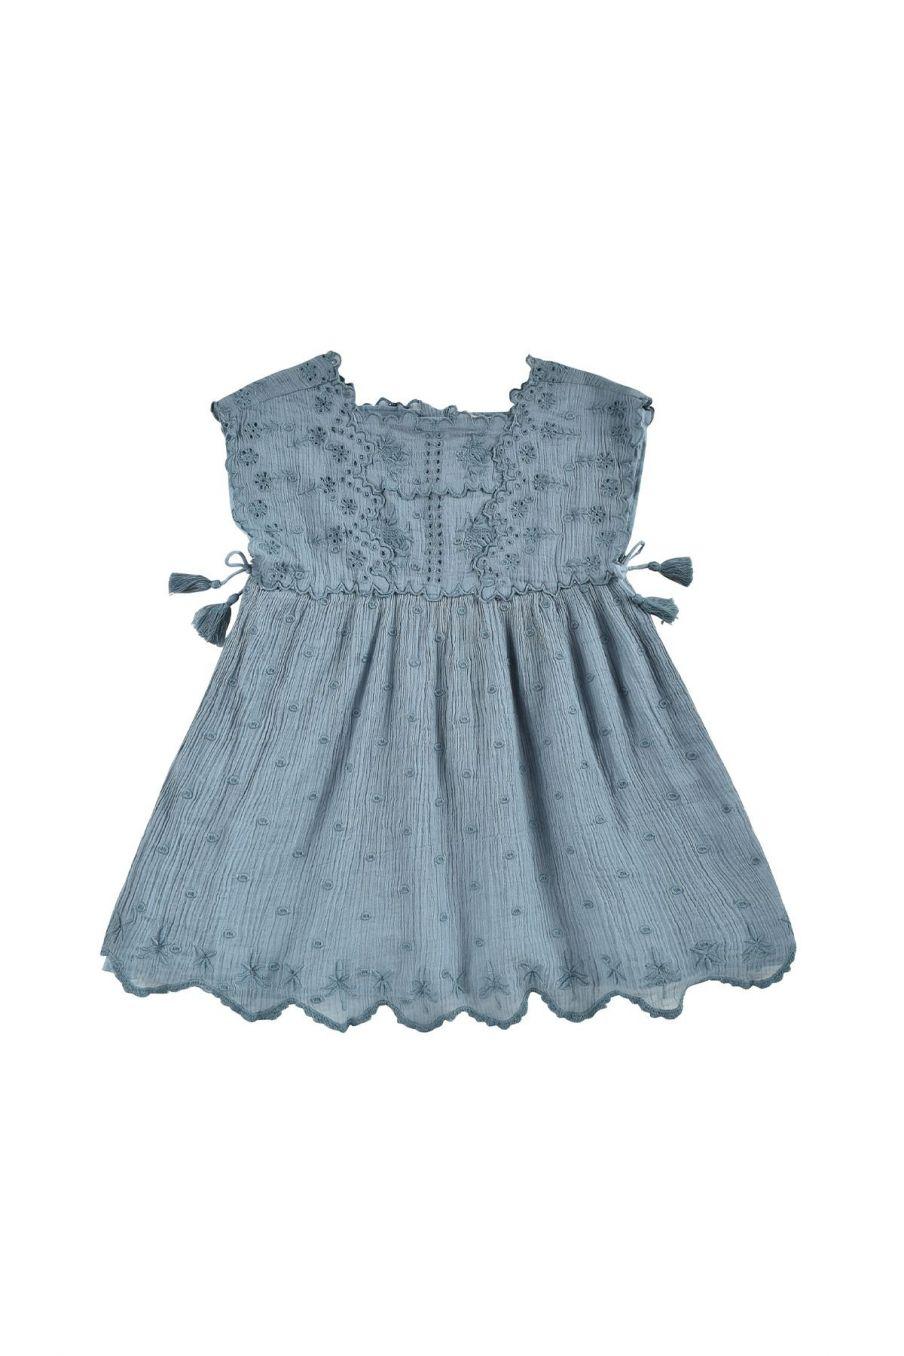 boheme chic vintage robe fille leilani storm plumetis